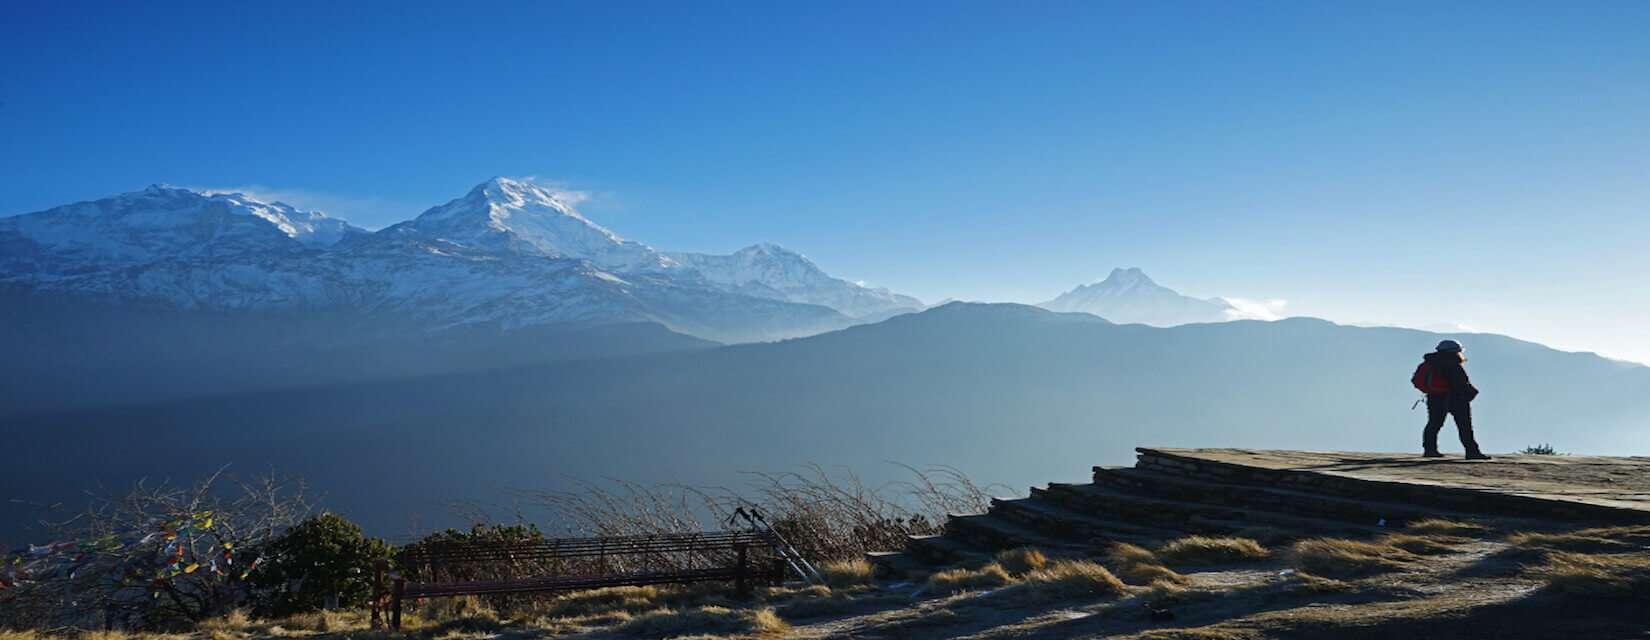 Annapurna Panorama Trek Nepal